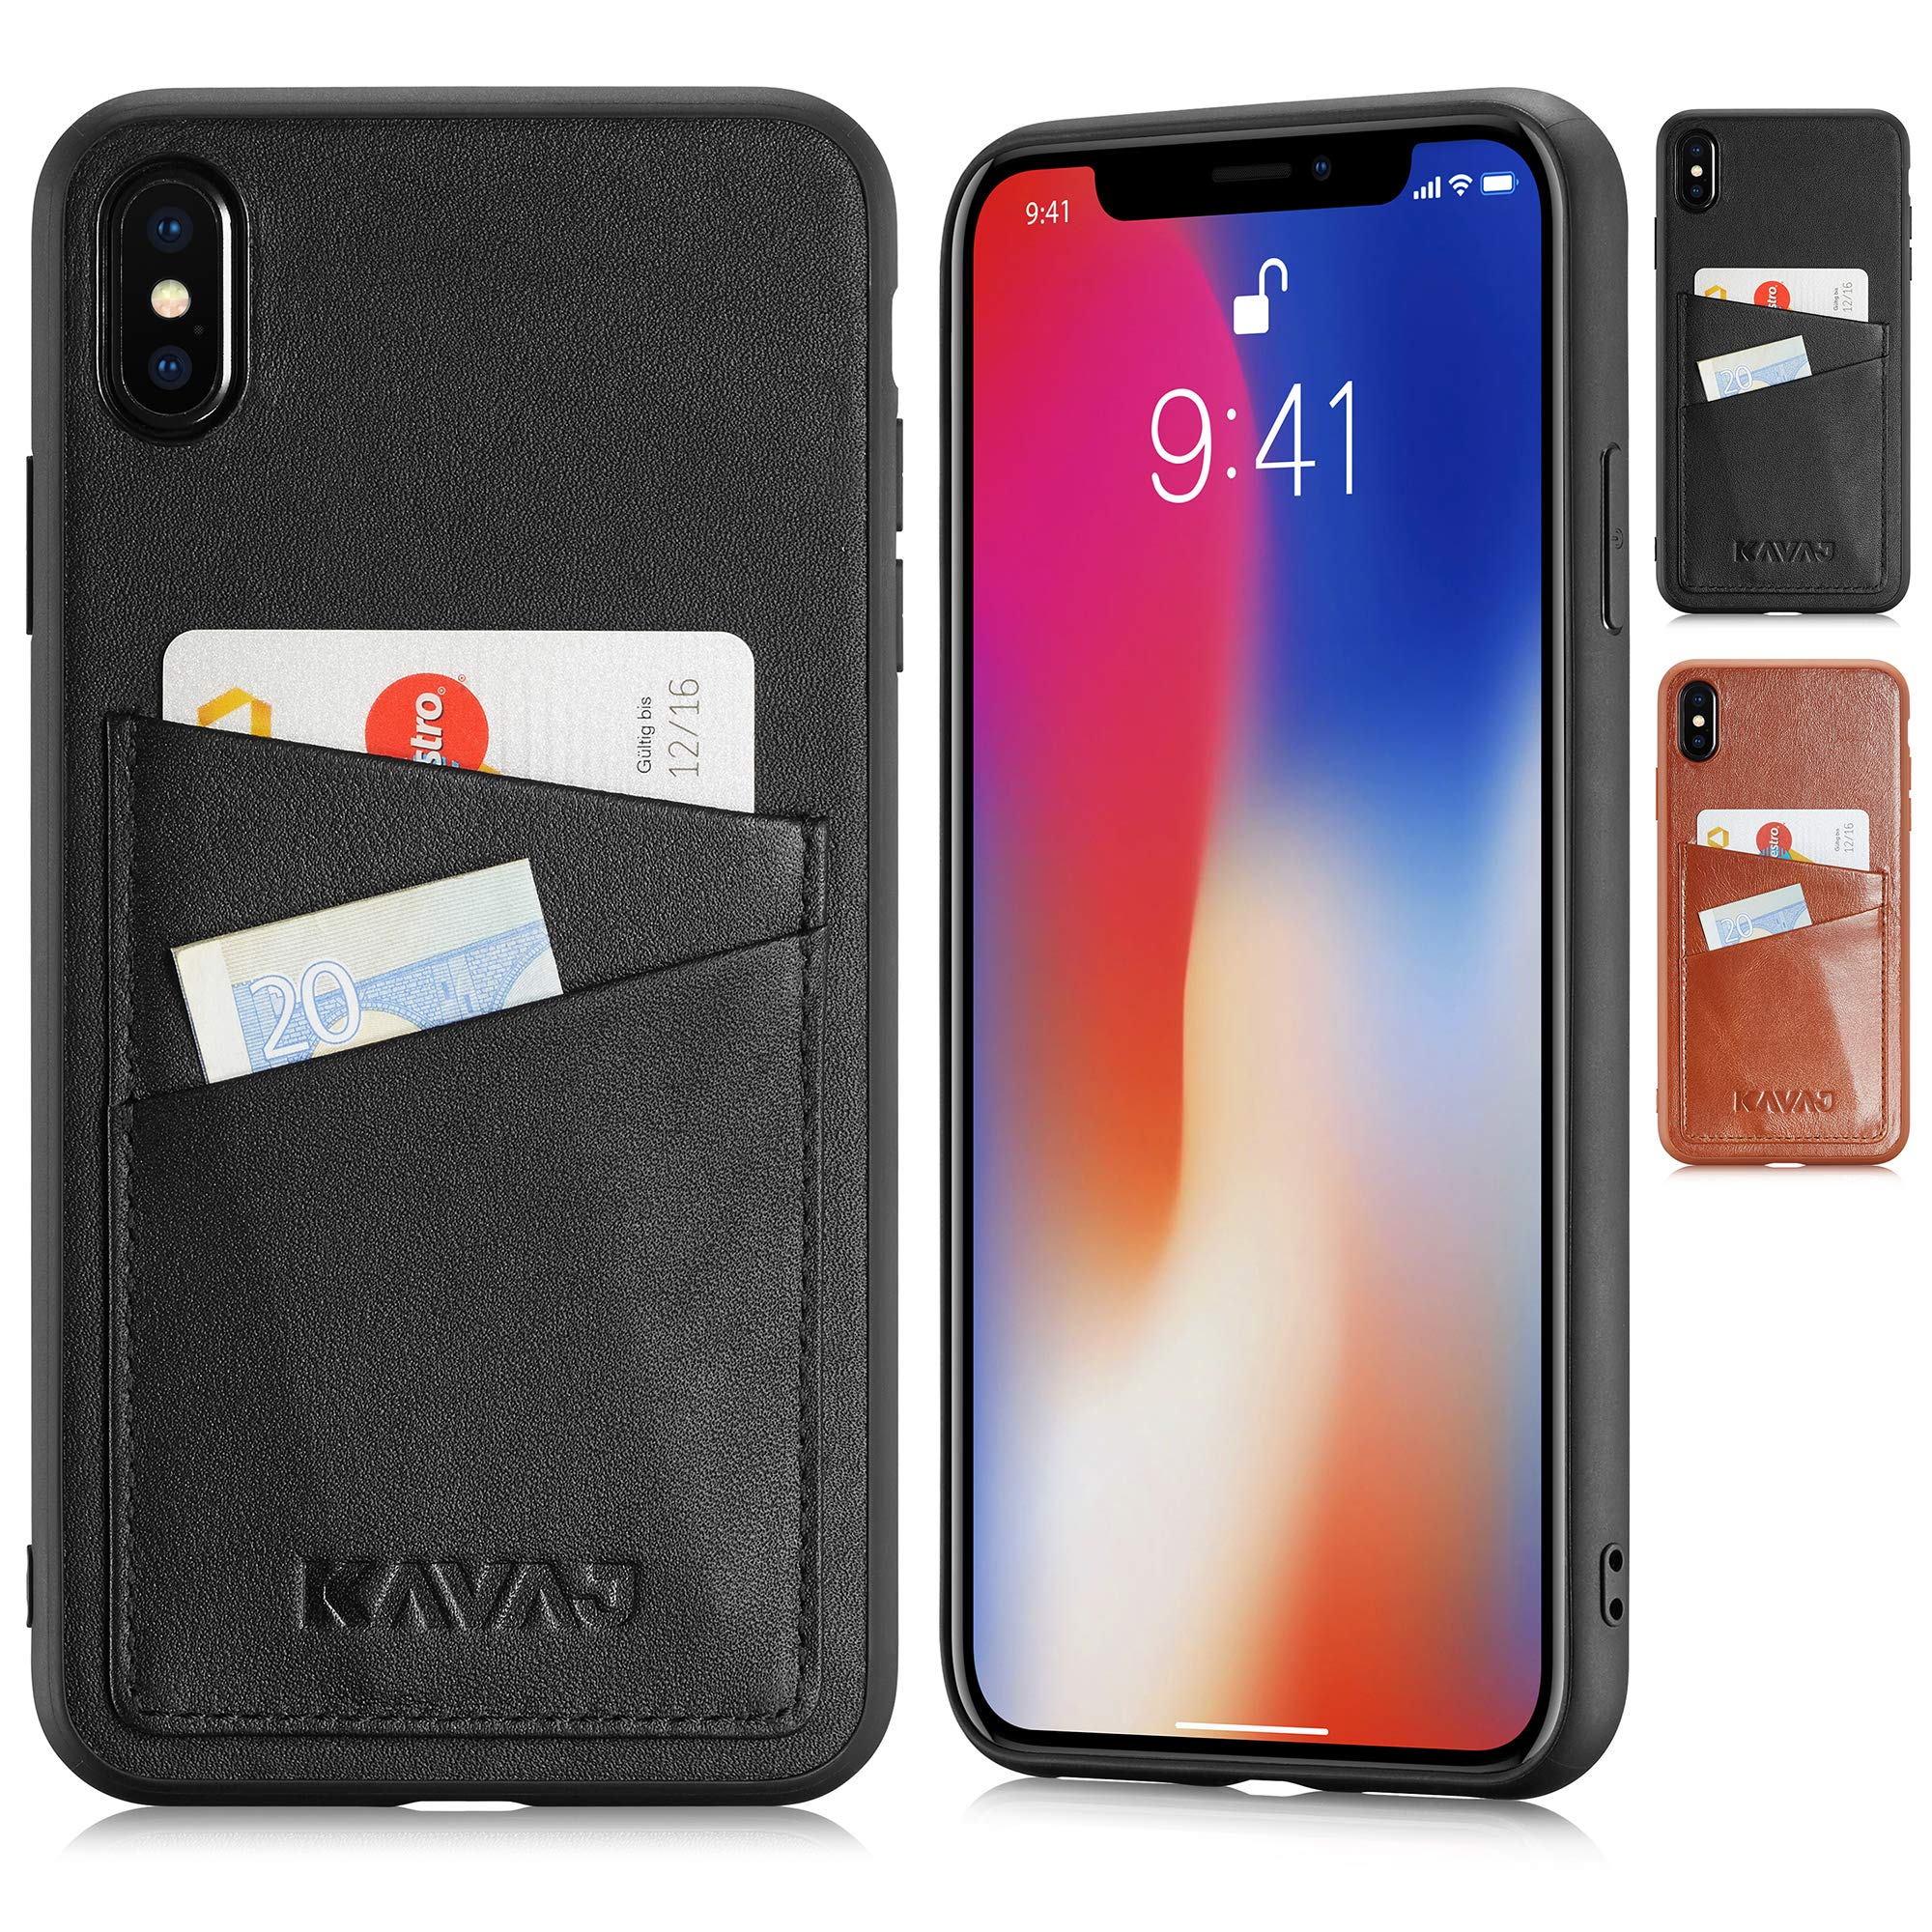 new arrival 3f94e 8e84b KAVAJ iPhone Xs Max 6.5″ Case Leather Tokyo Black or Cognac-Brown